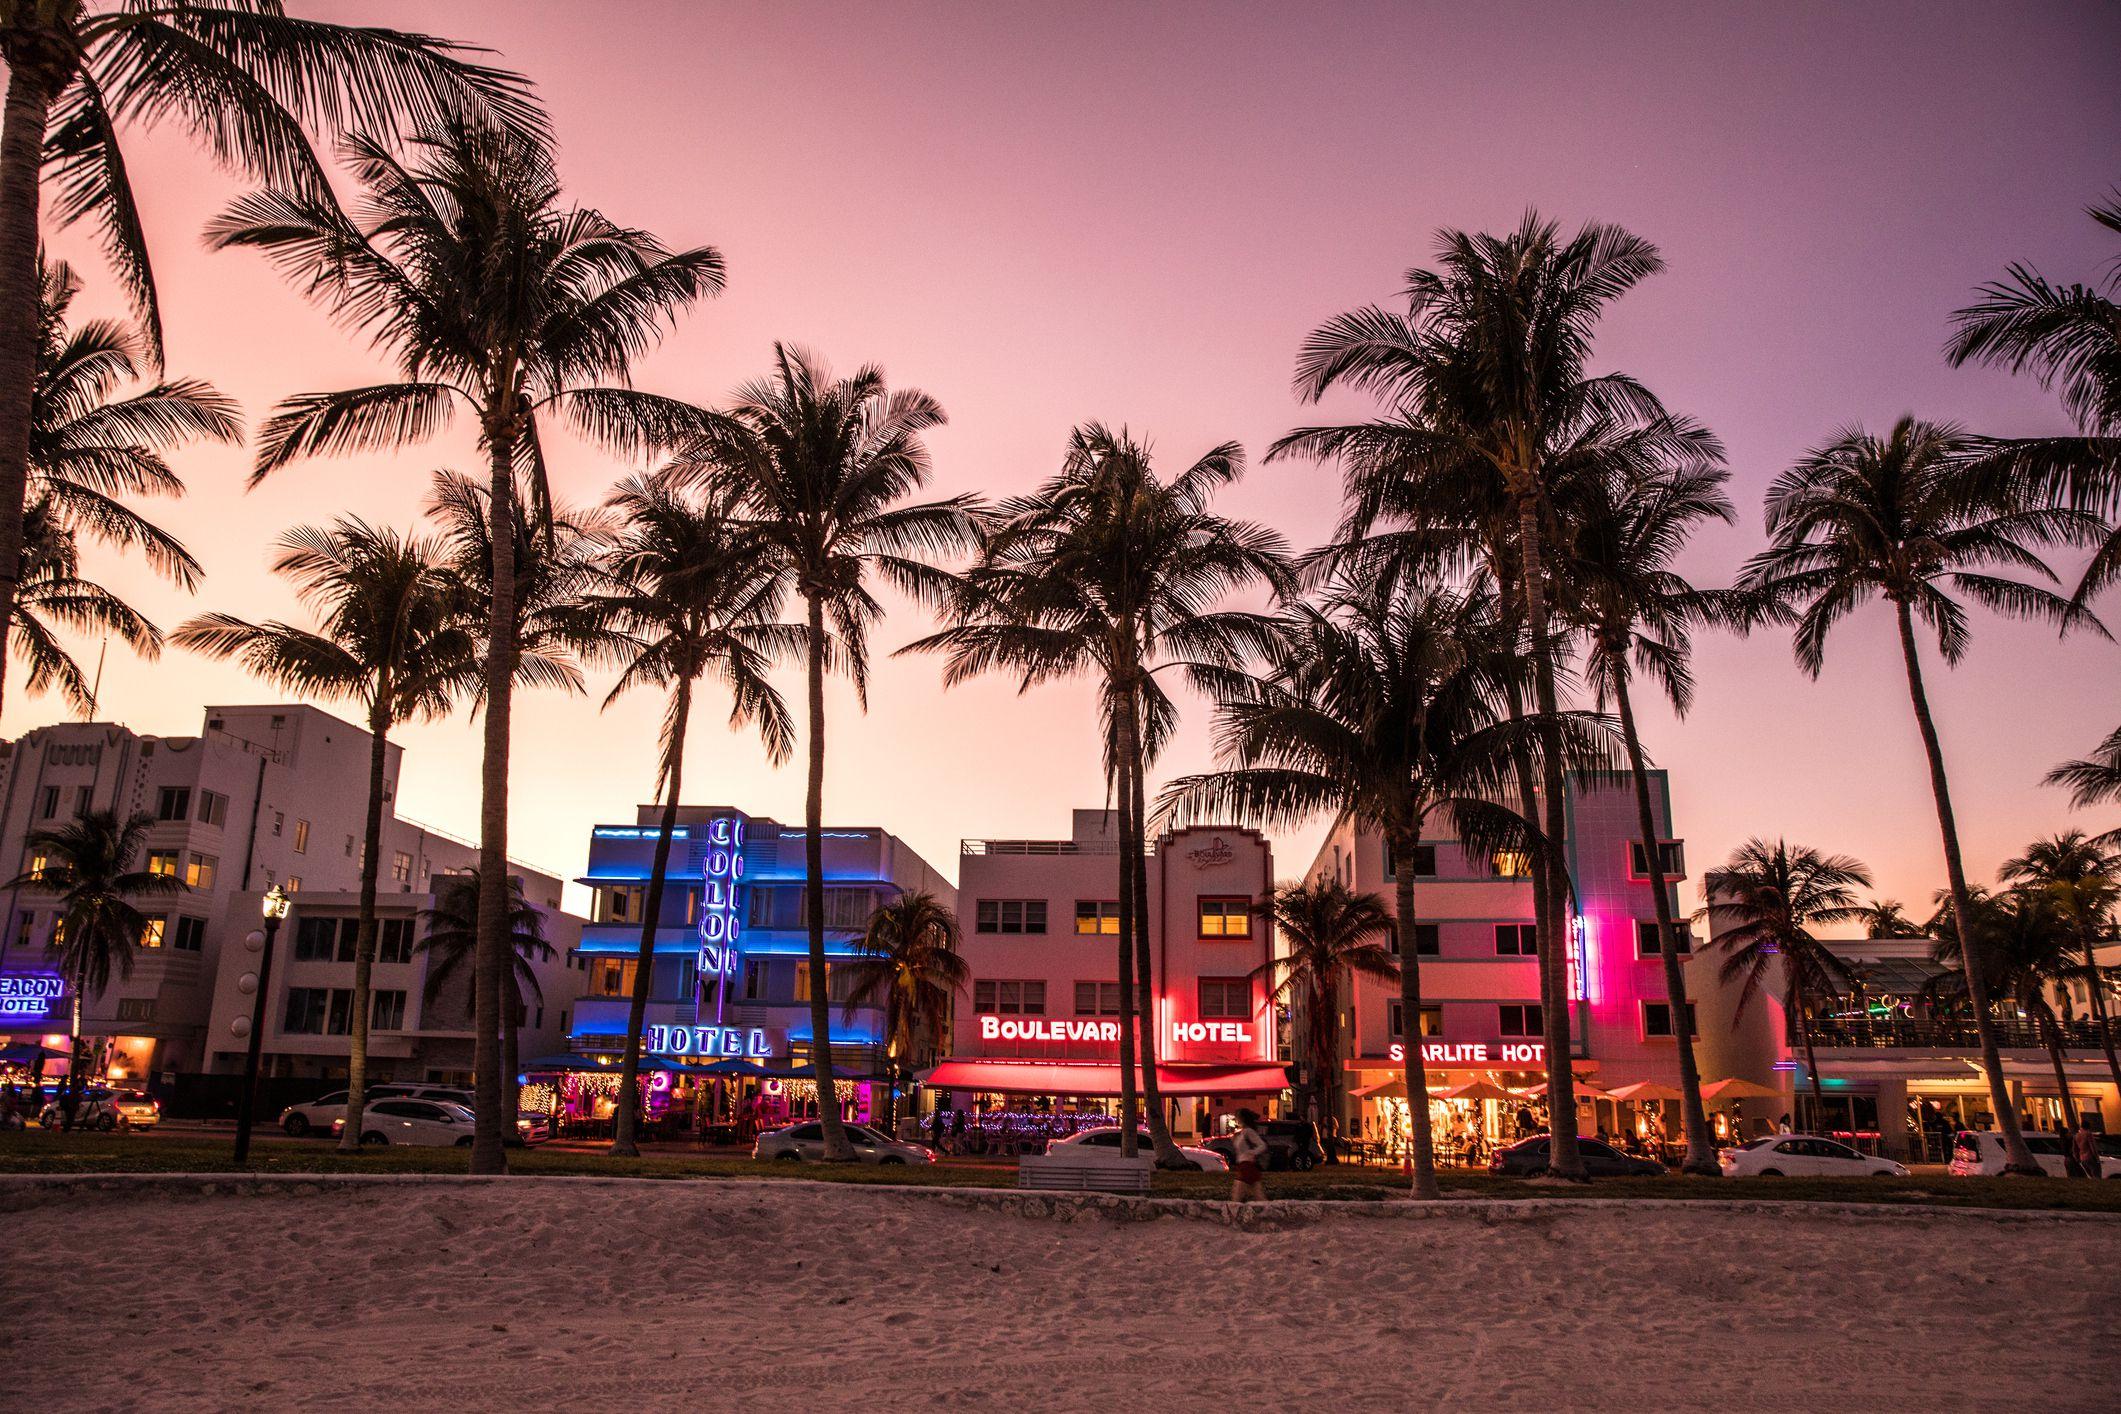 South Beach, Miami, Florida